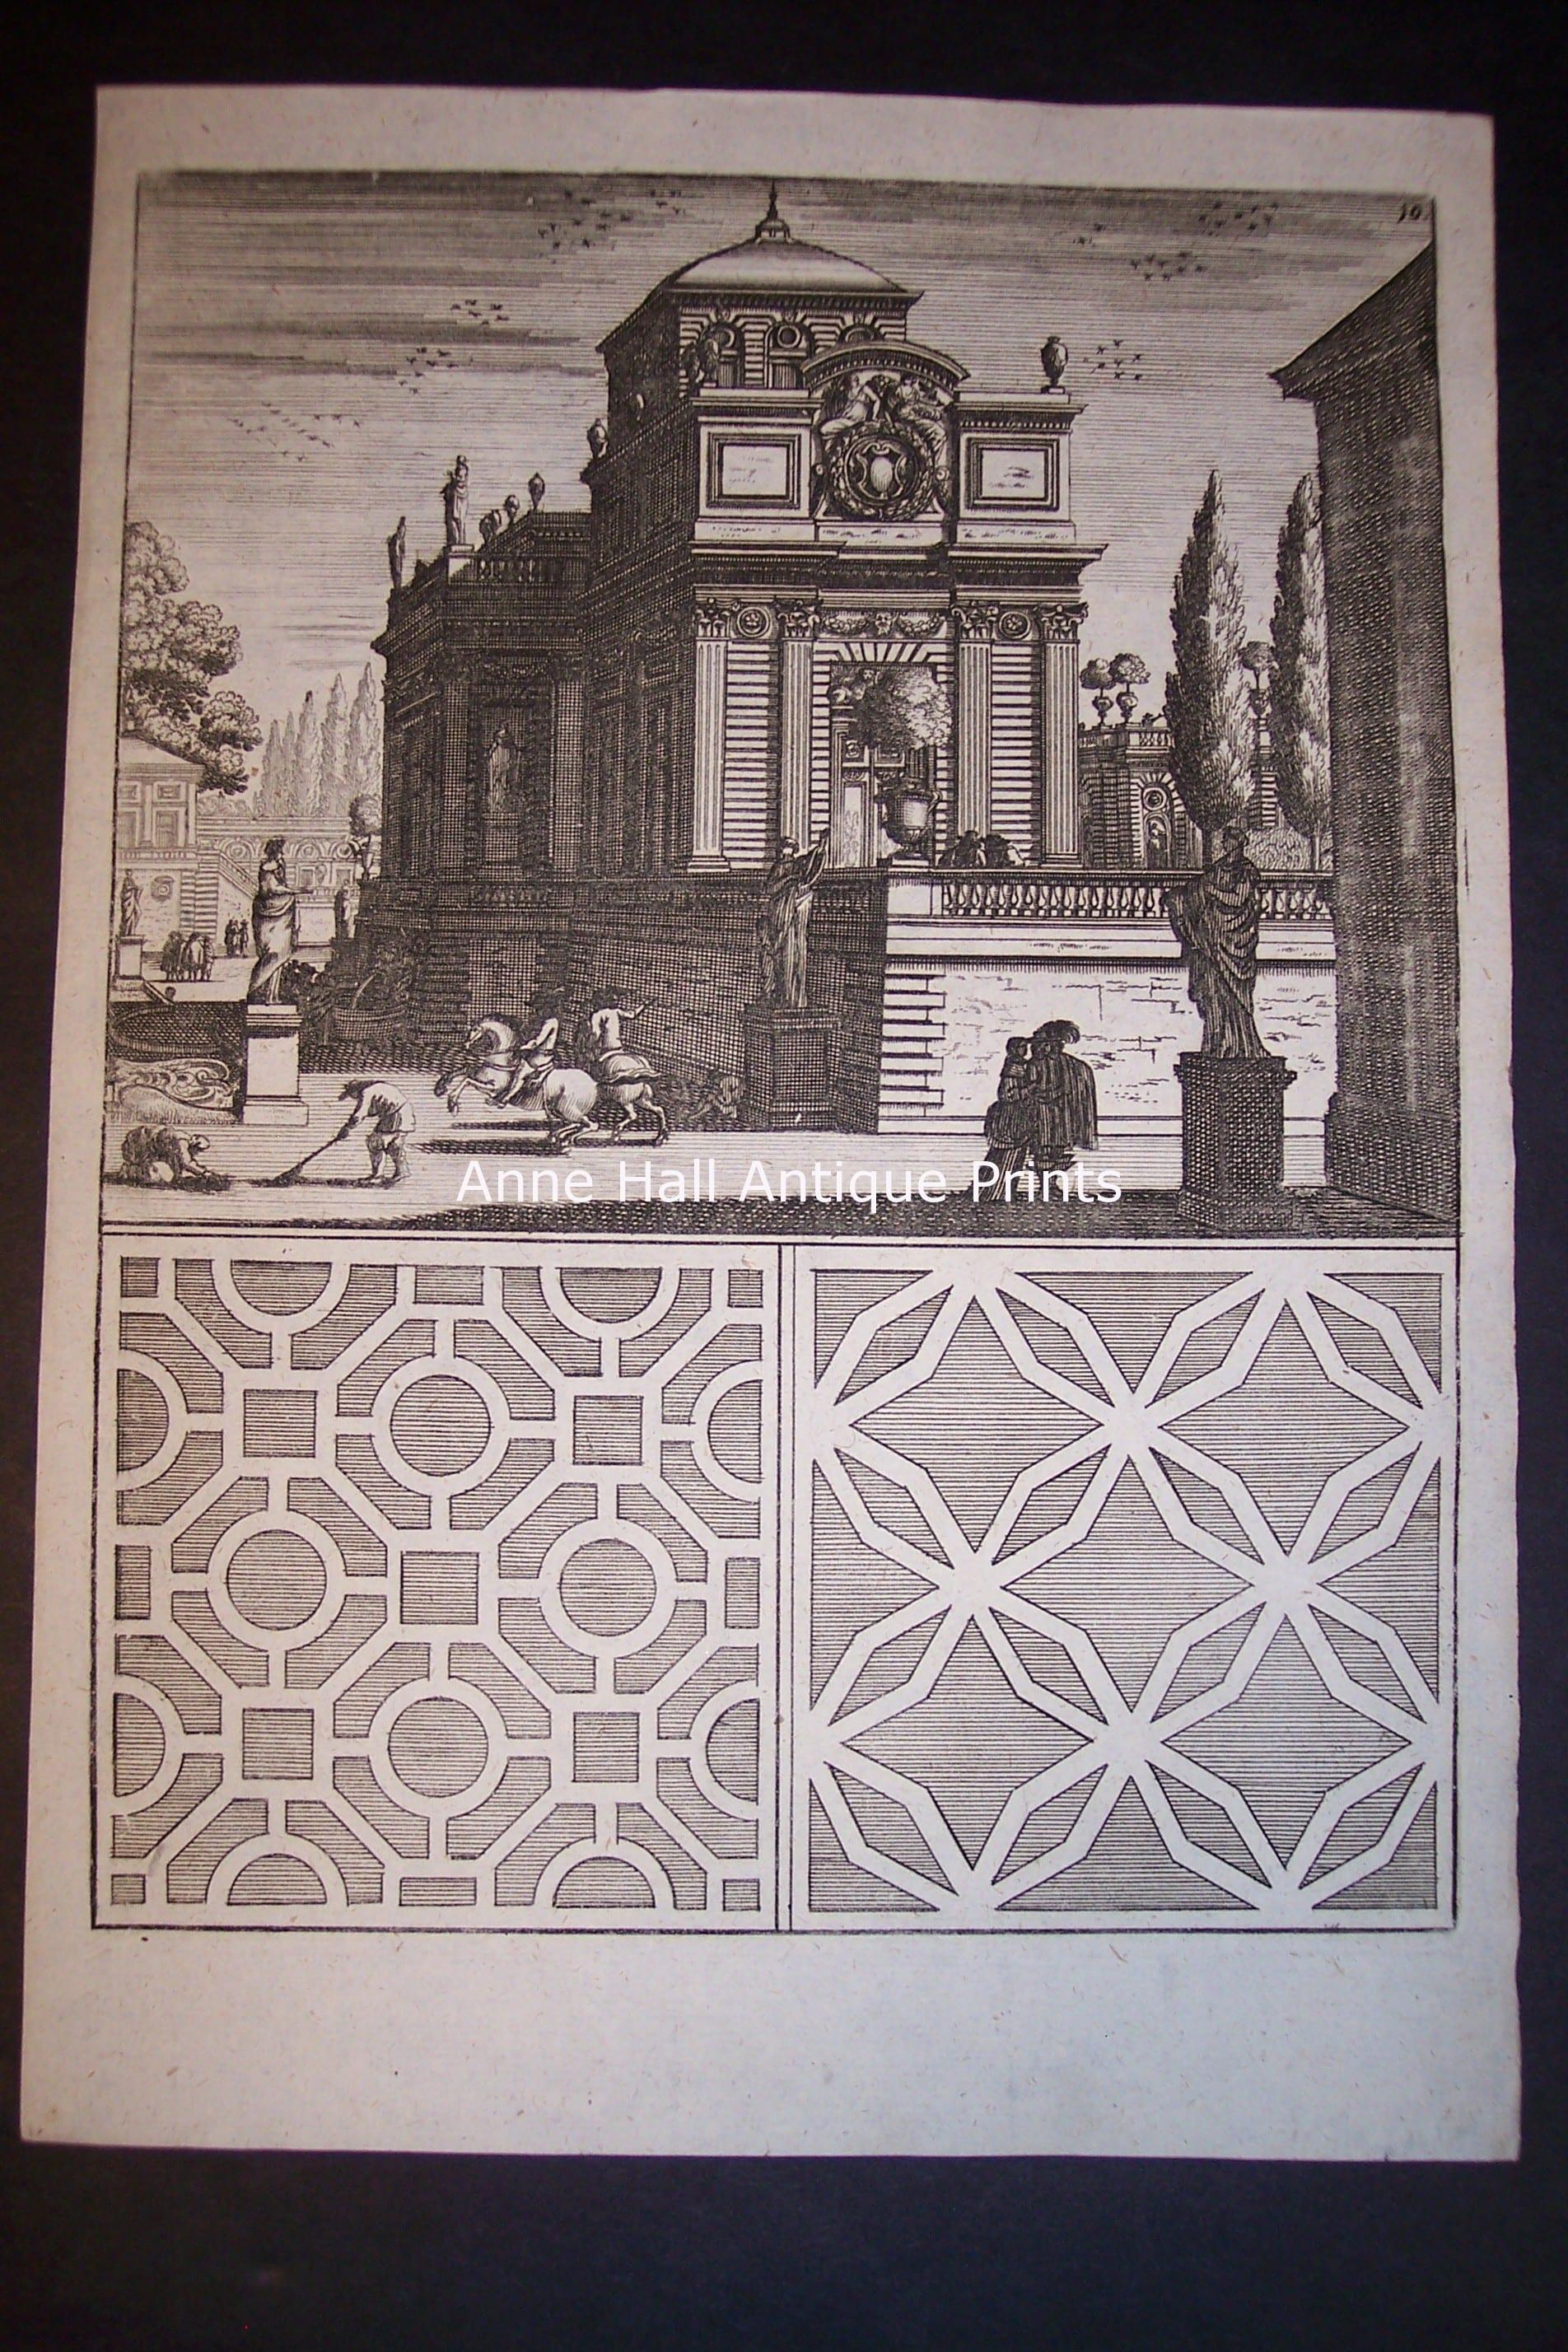 Architecture Bockler Fountain Print 0288